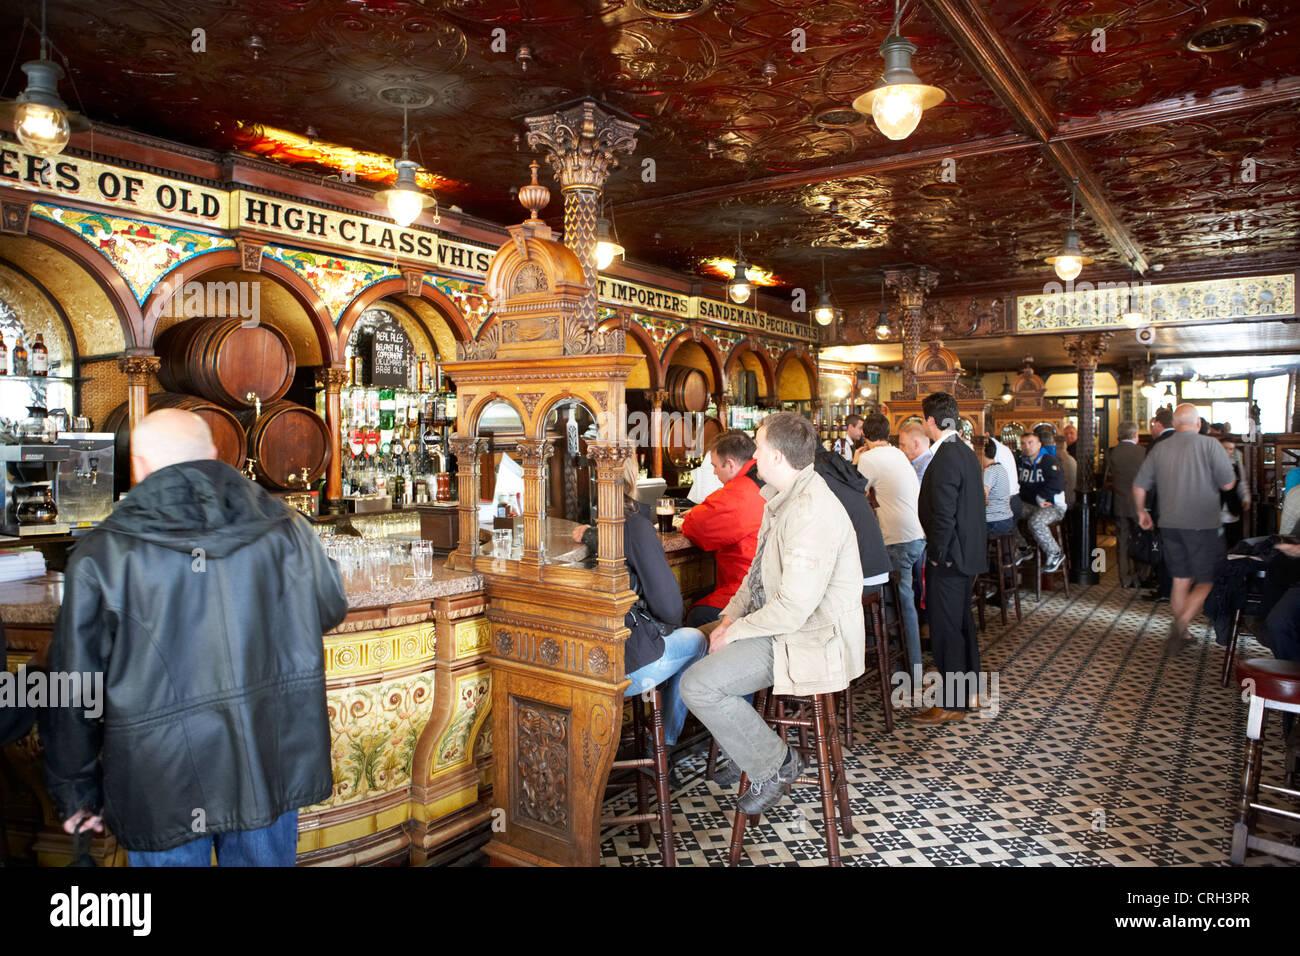 interior of the crown liquor saloon bar pub in belfast northern ireland uk - Stock Image